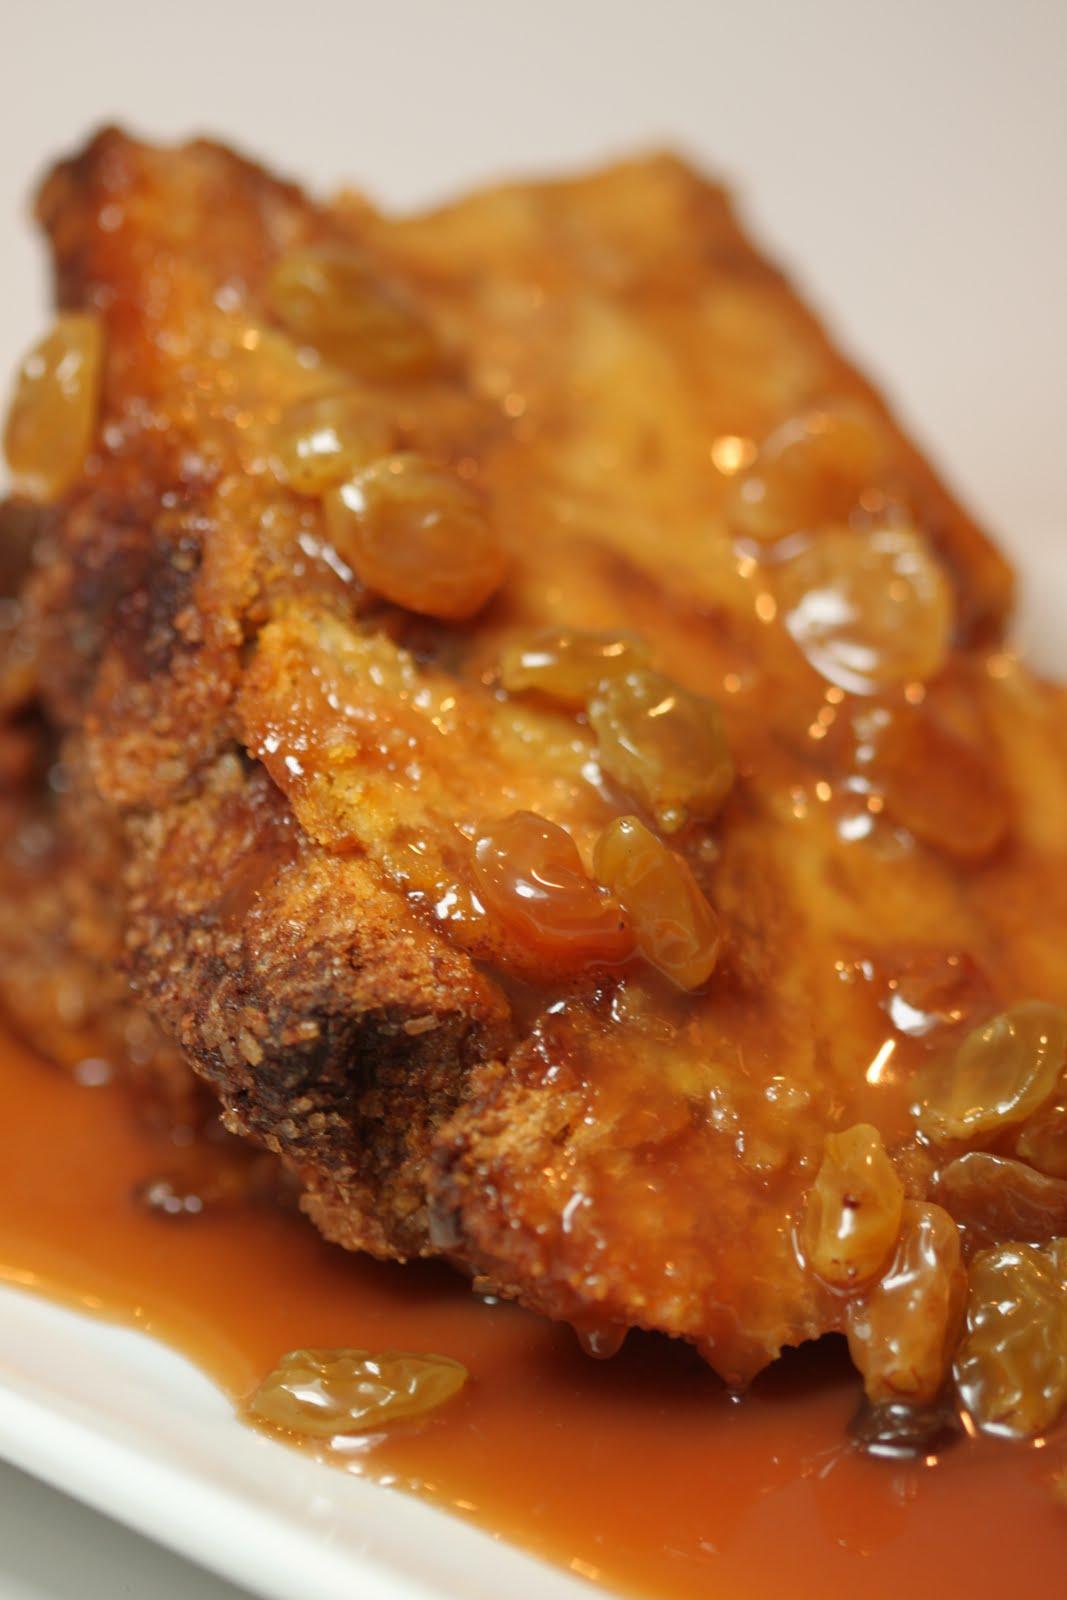 ... Melissa Sundays - Pumpkin Bread Pudding with Caramel Rum Raisin Sauce